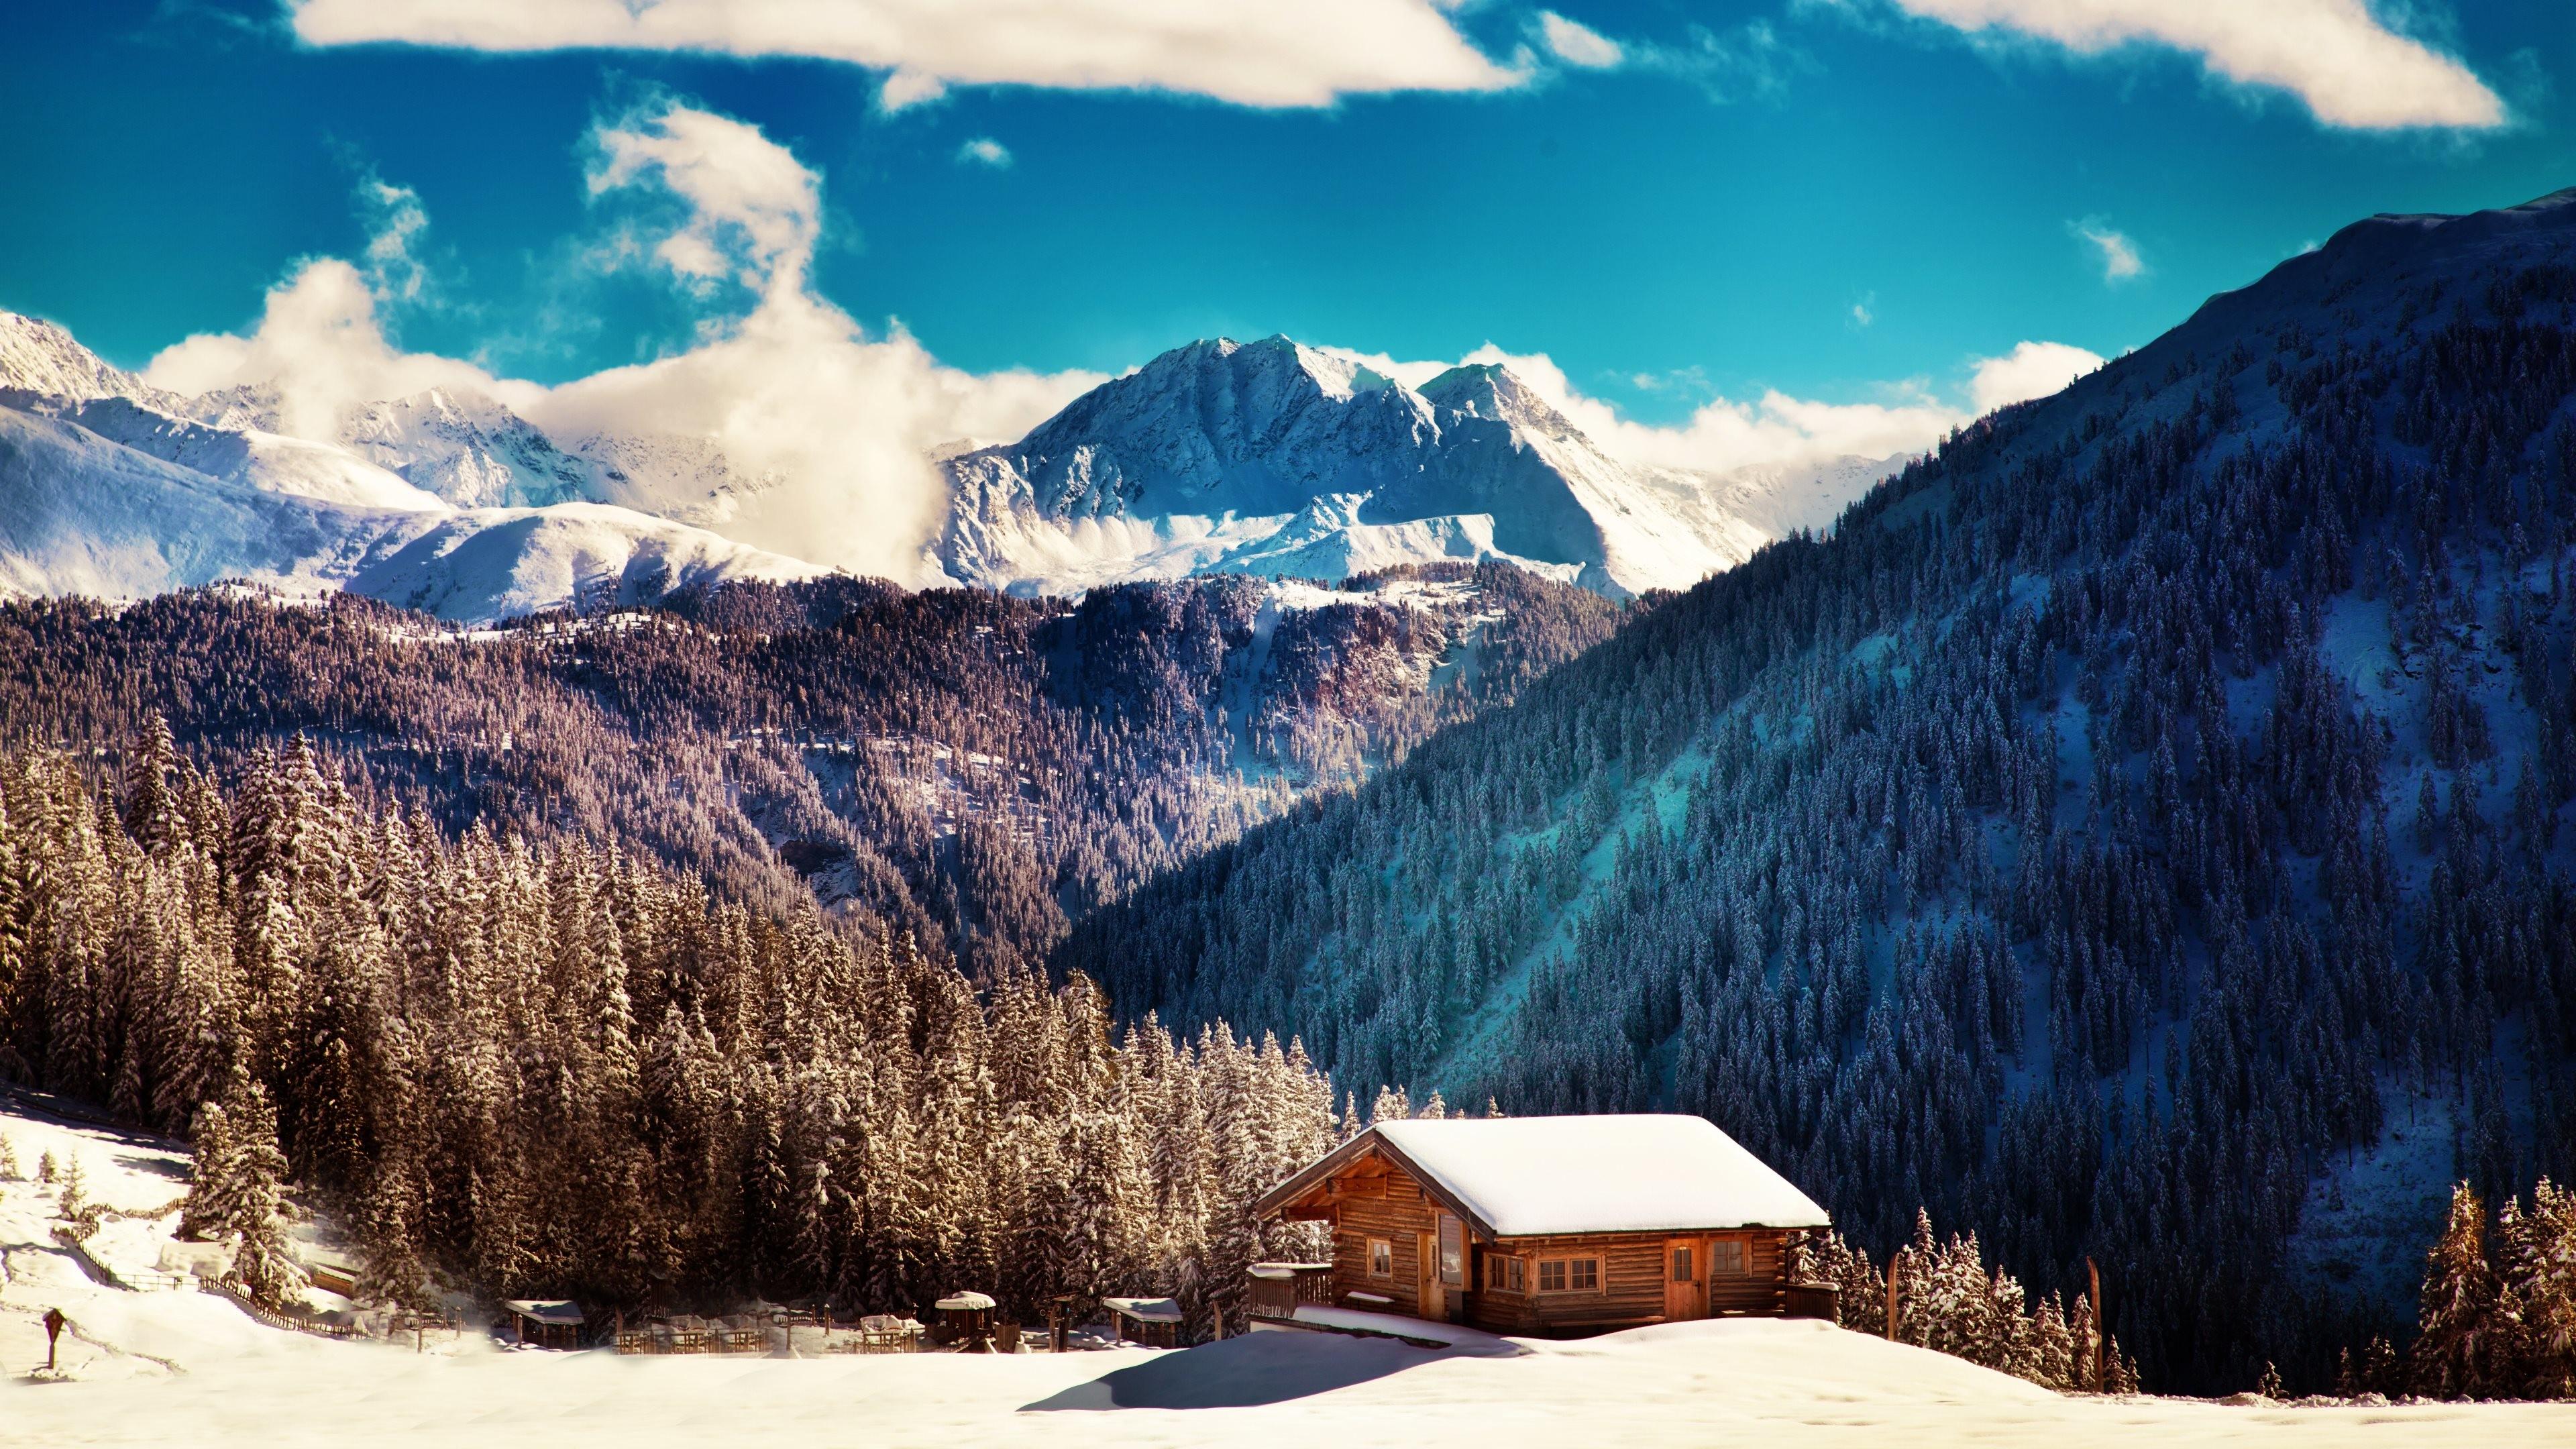 2800x1800 Snowy Mountain Nature HD Wallpaper Wide